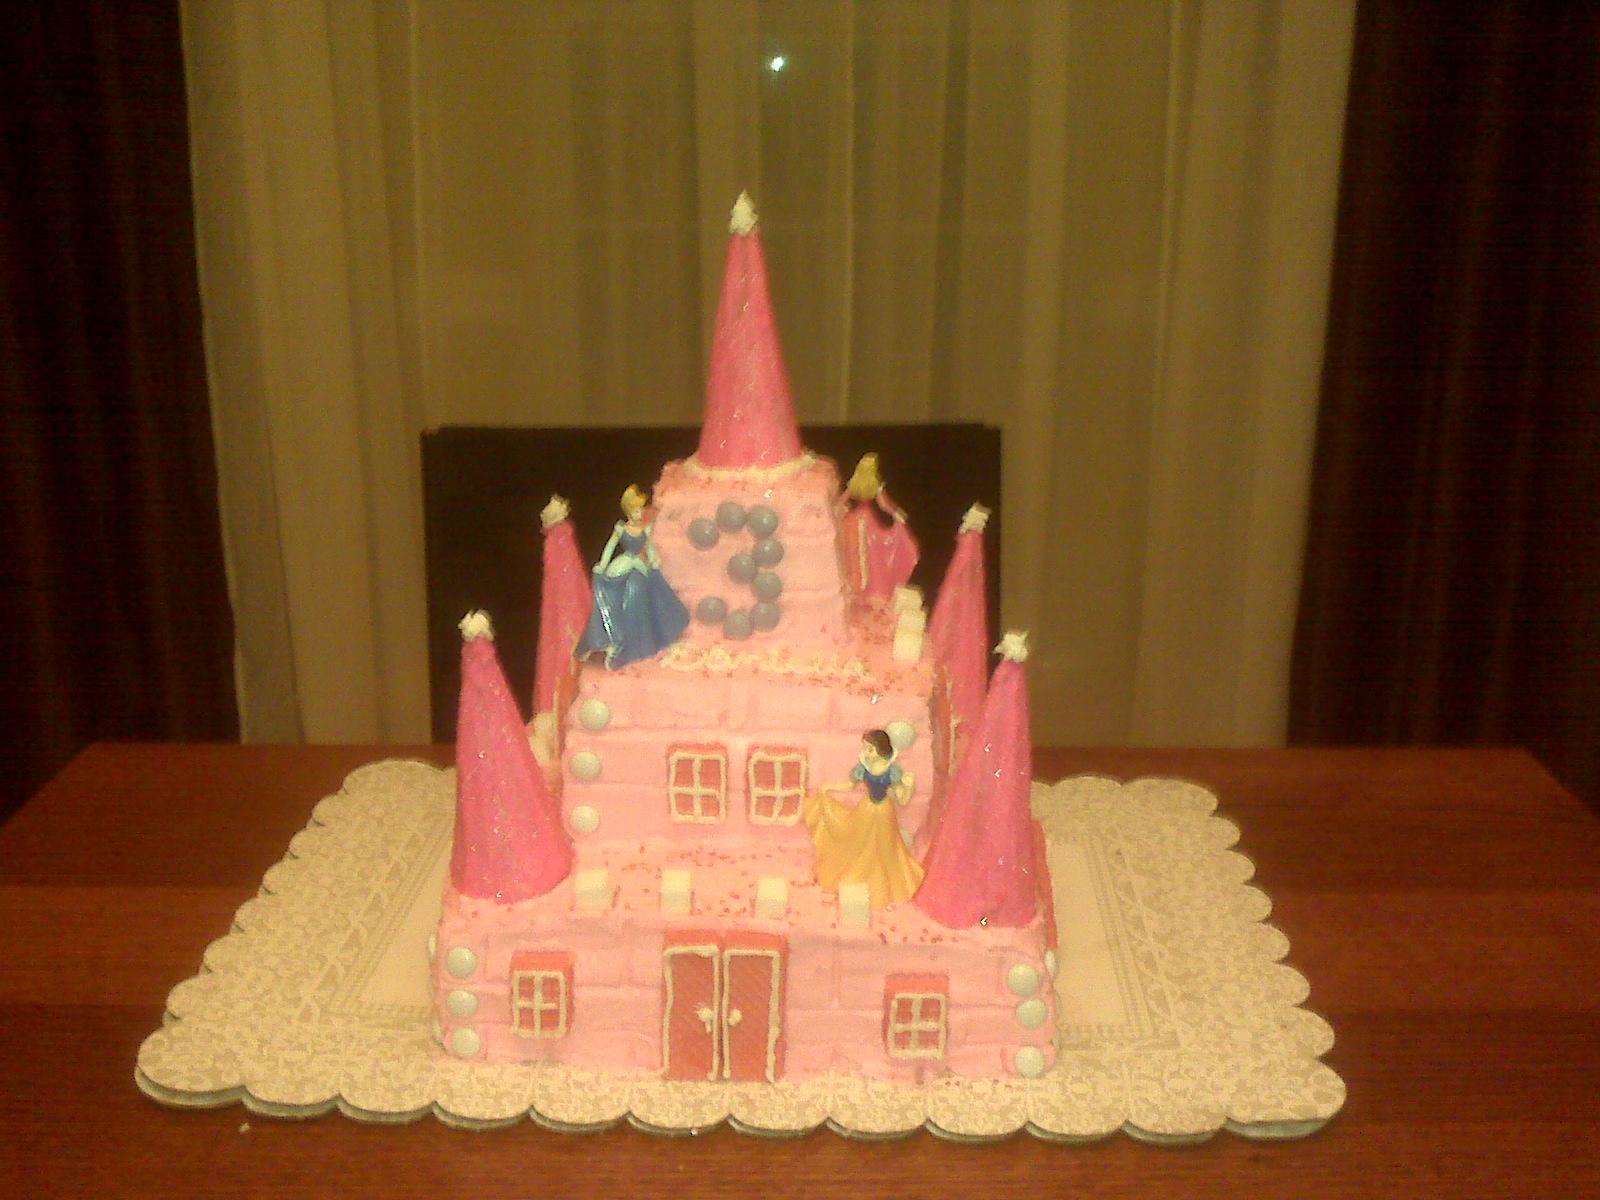 Homemade Princess Birthday Cake Image Inspiration of Cake and